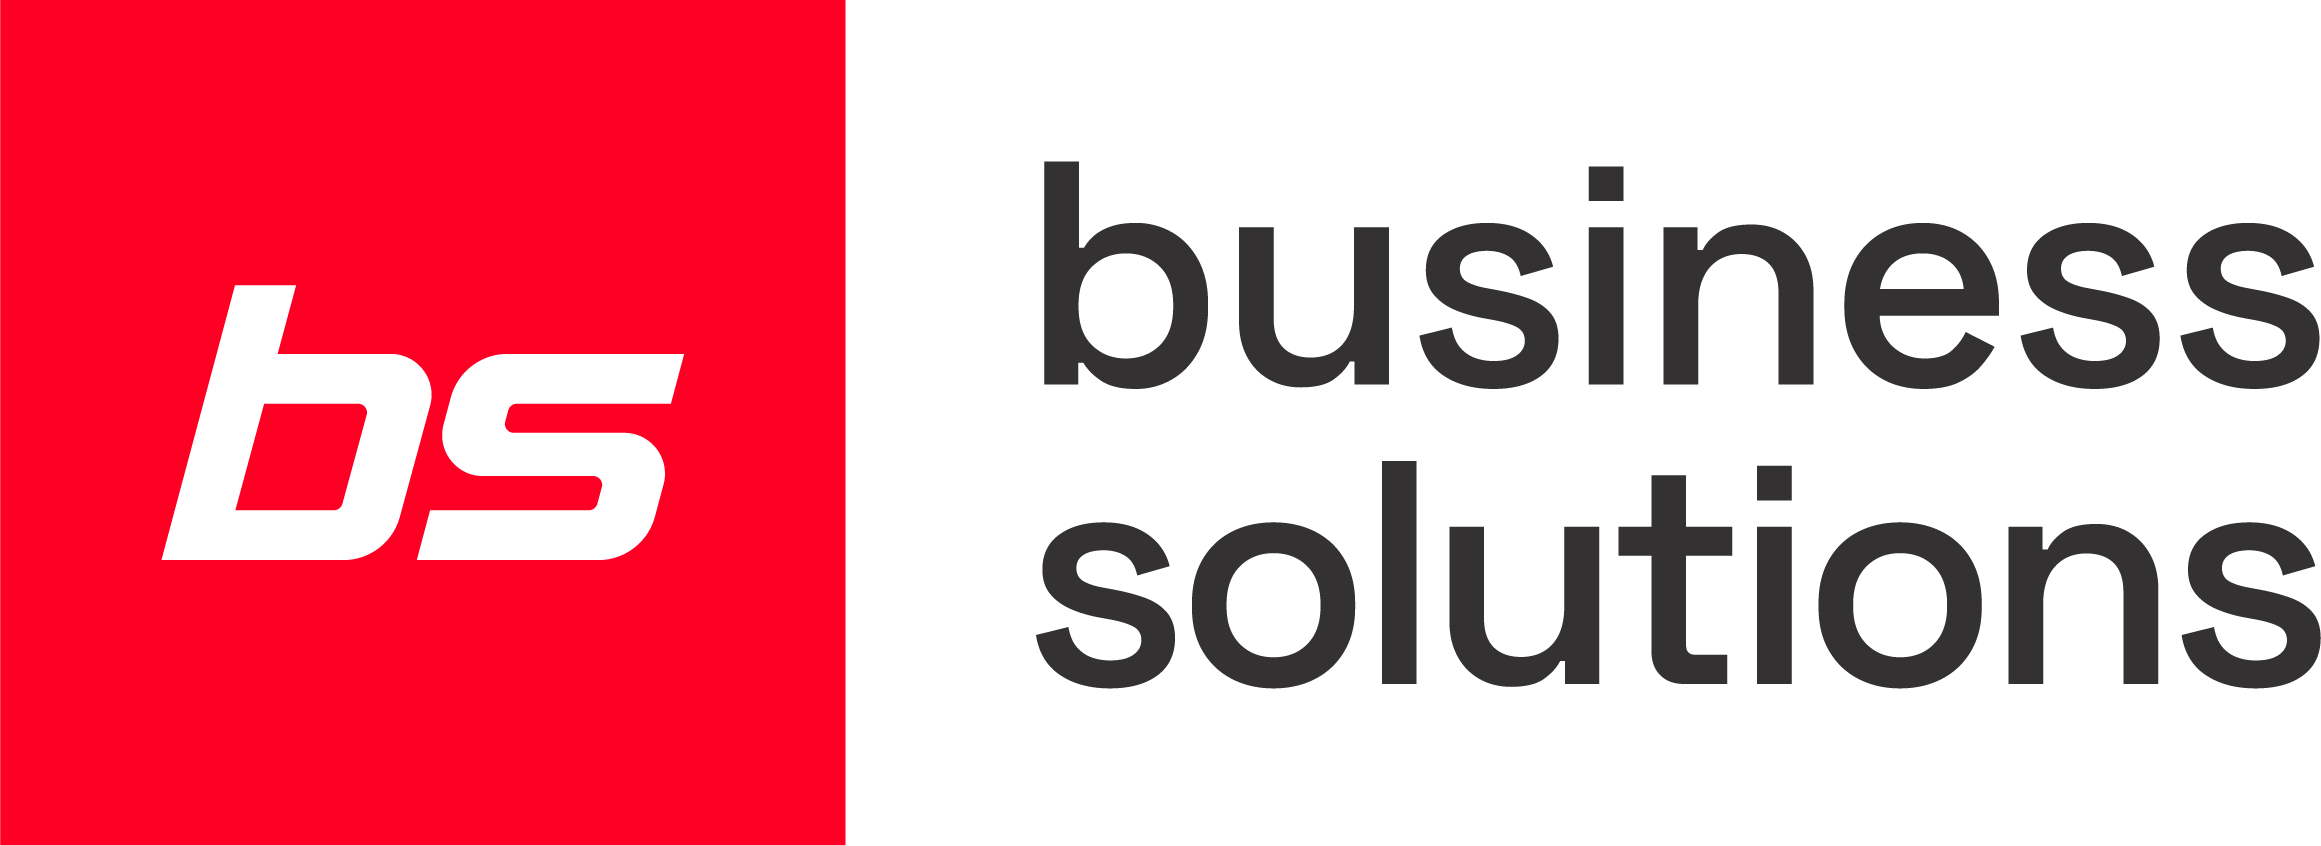 Busines solution